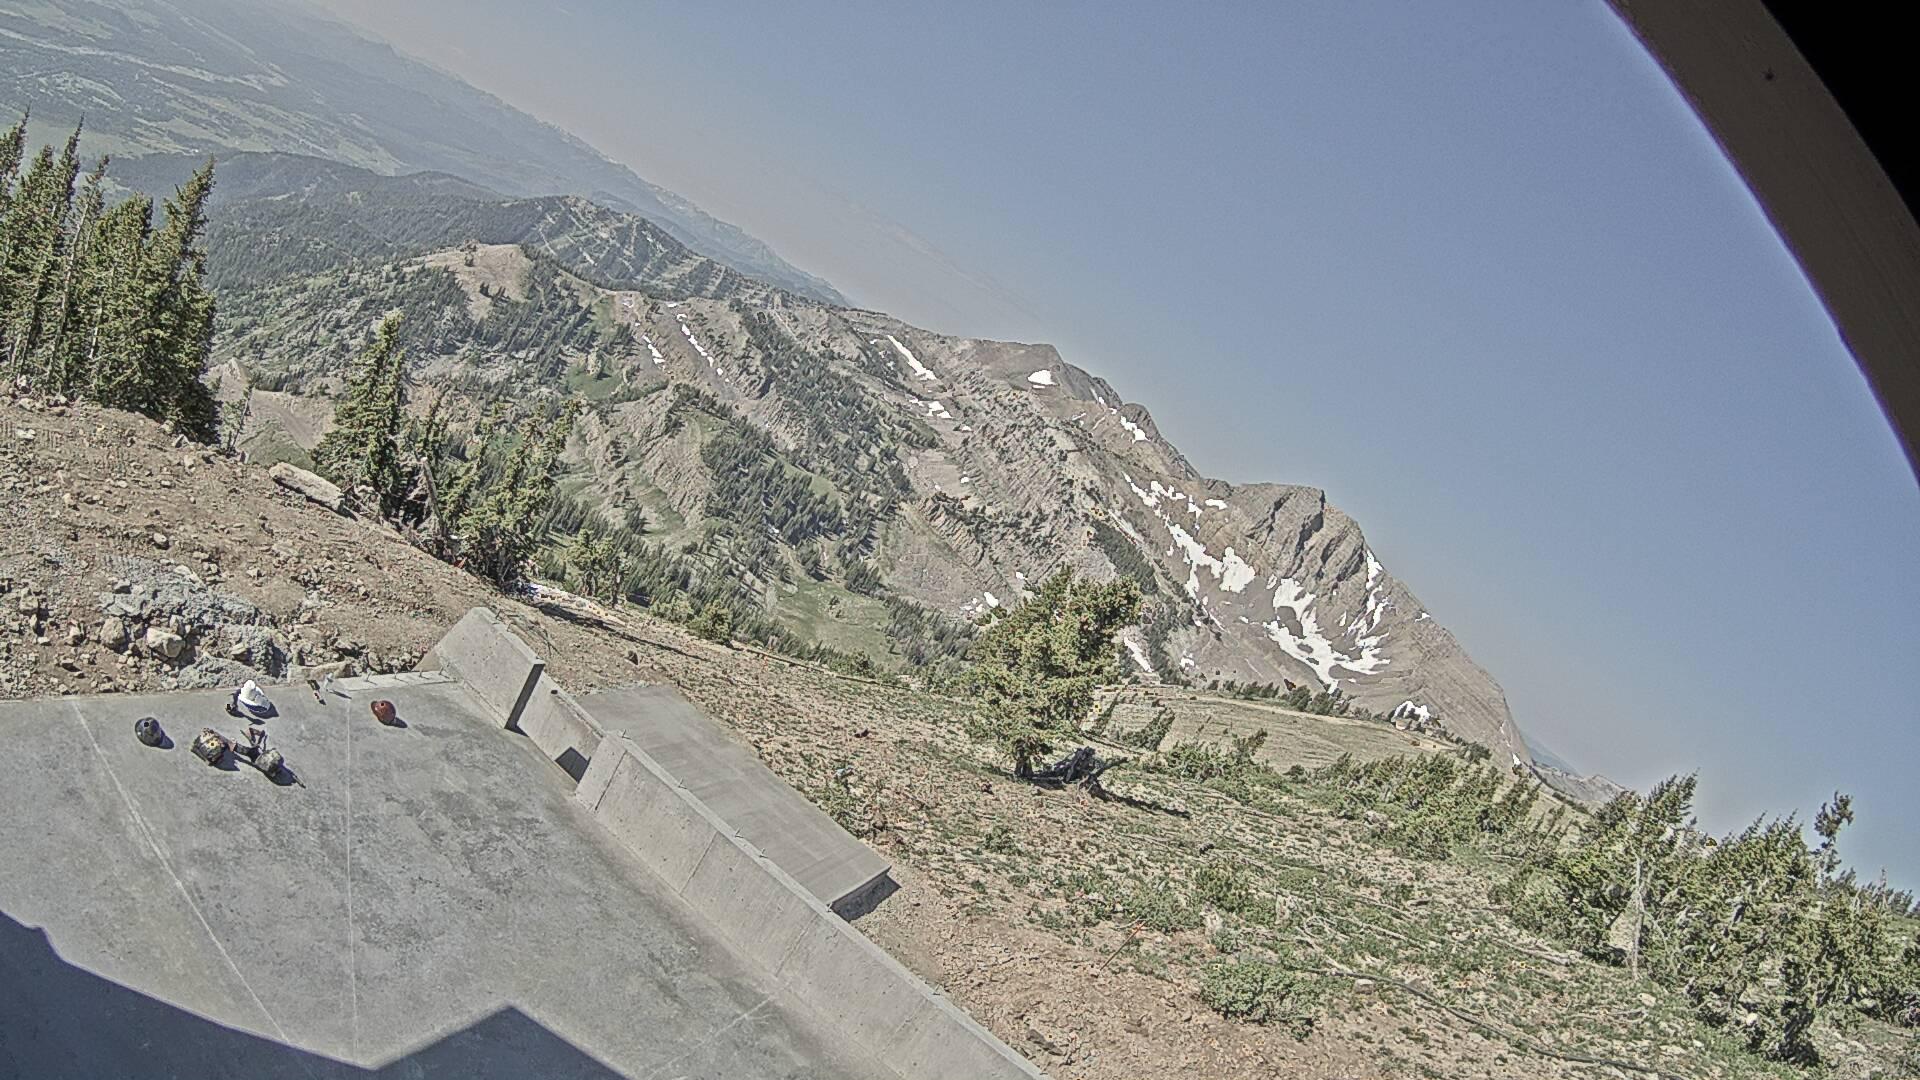 Jackson Hole Tram Summit Webcam Image